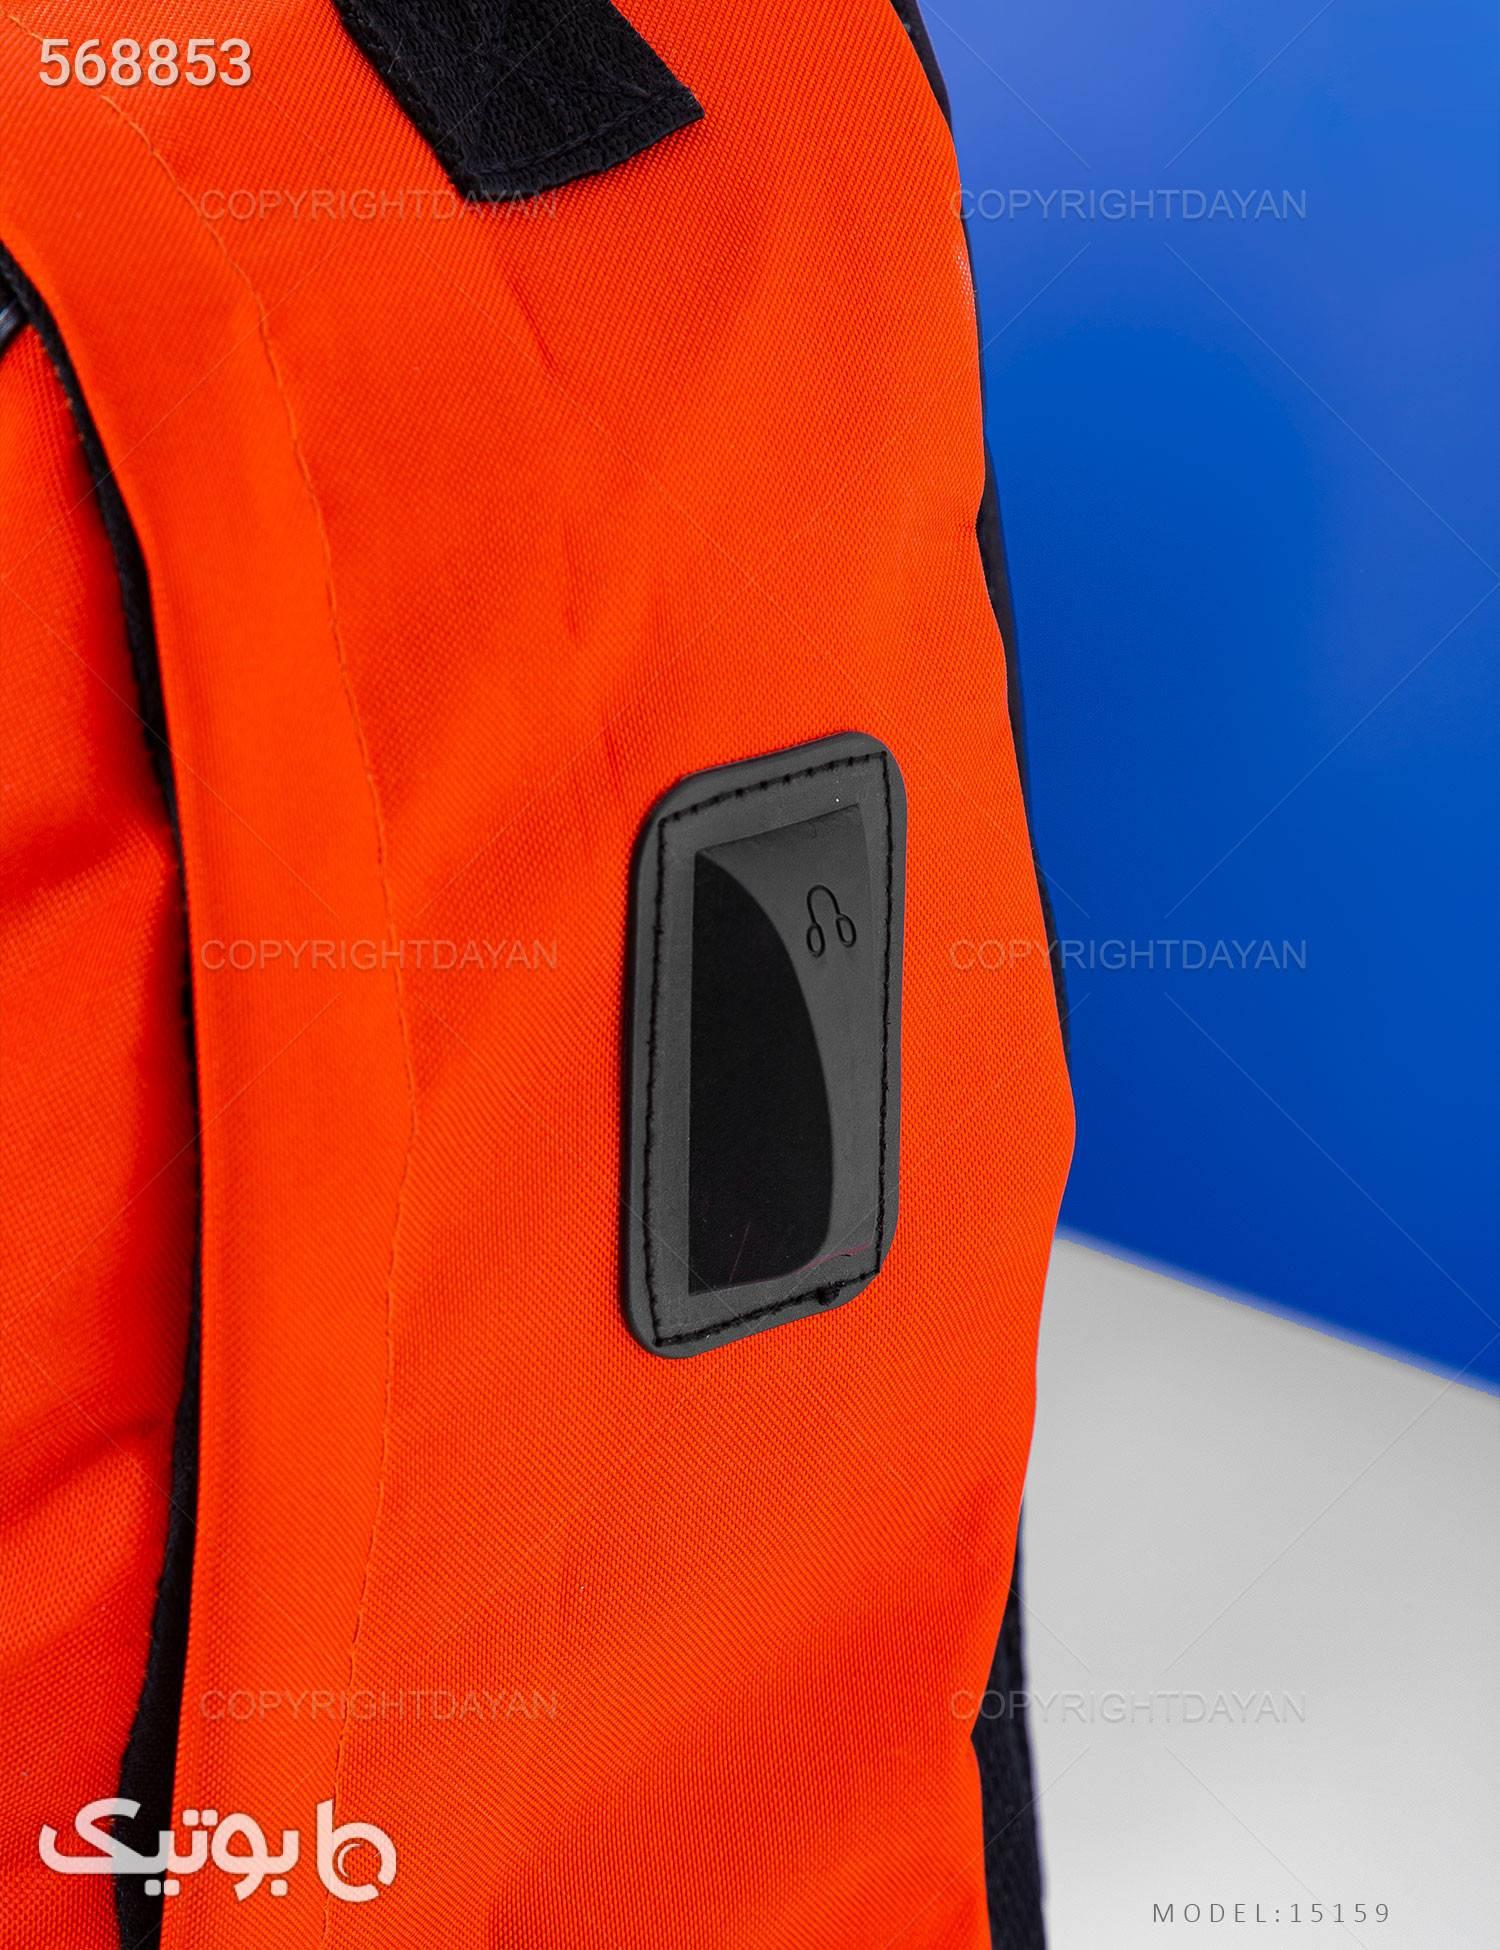 کوله پشتی  Brook مدل 15159 نارنجی کوله پشتی